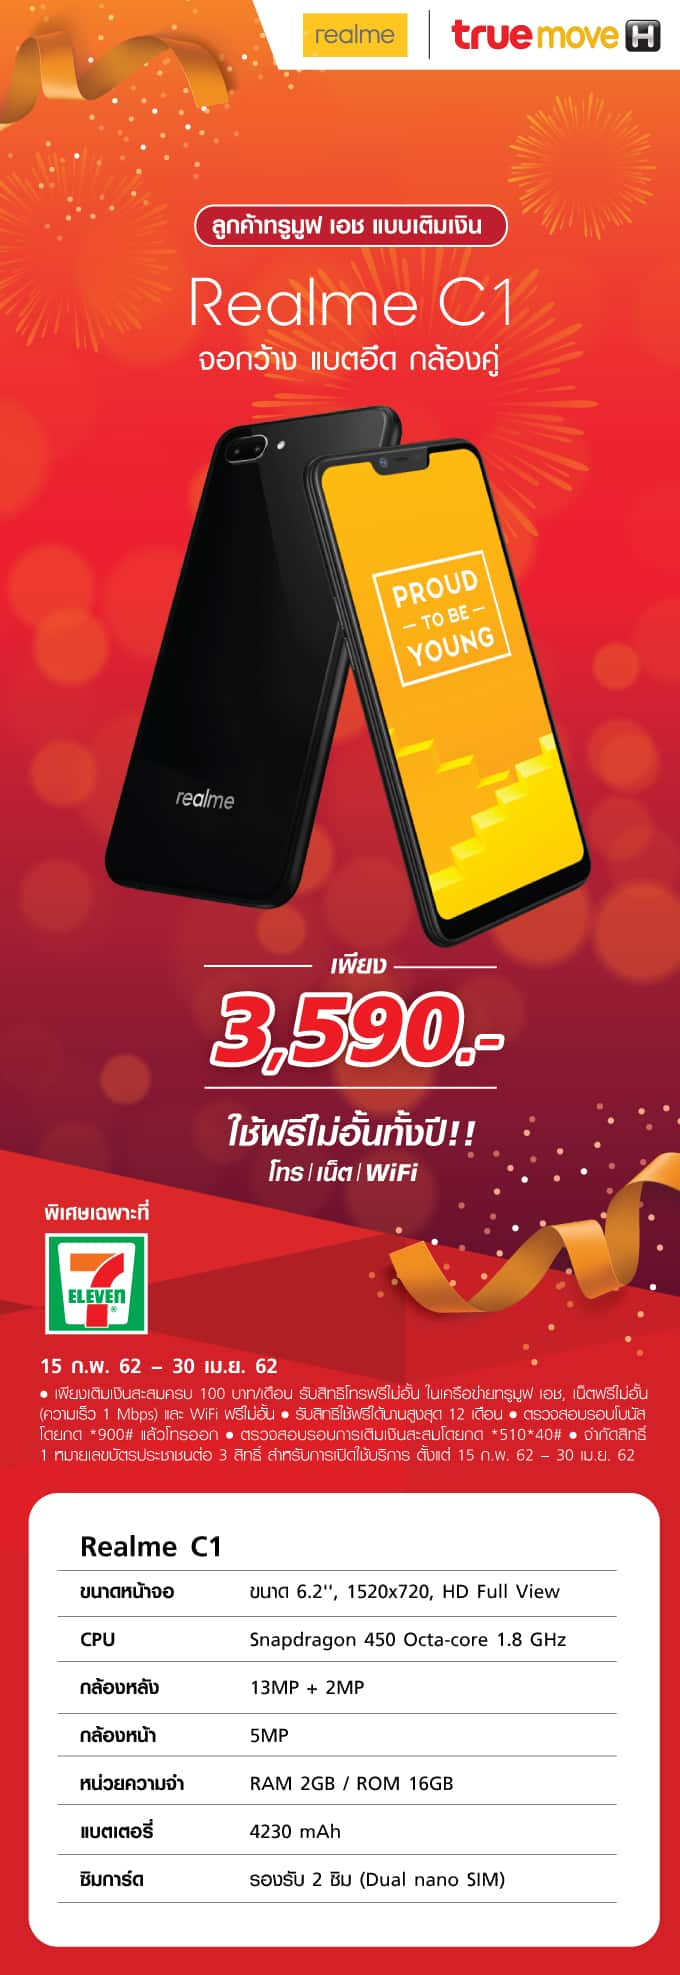 Realme C1 Landing Page Desktop TH 680 - TrueMove H วางขาย Realme C1 ที่ 7-Eleven ราคา 3,590 บาท